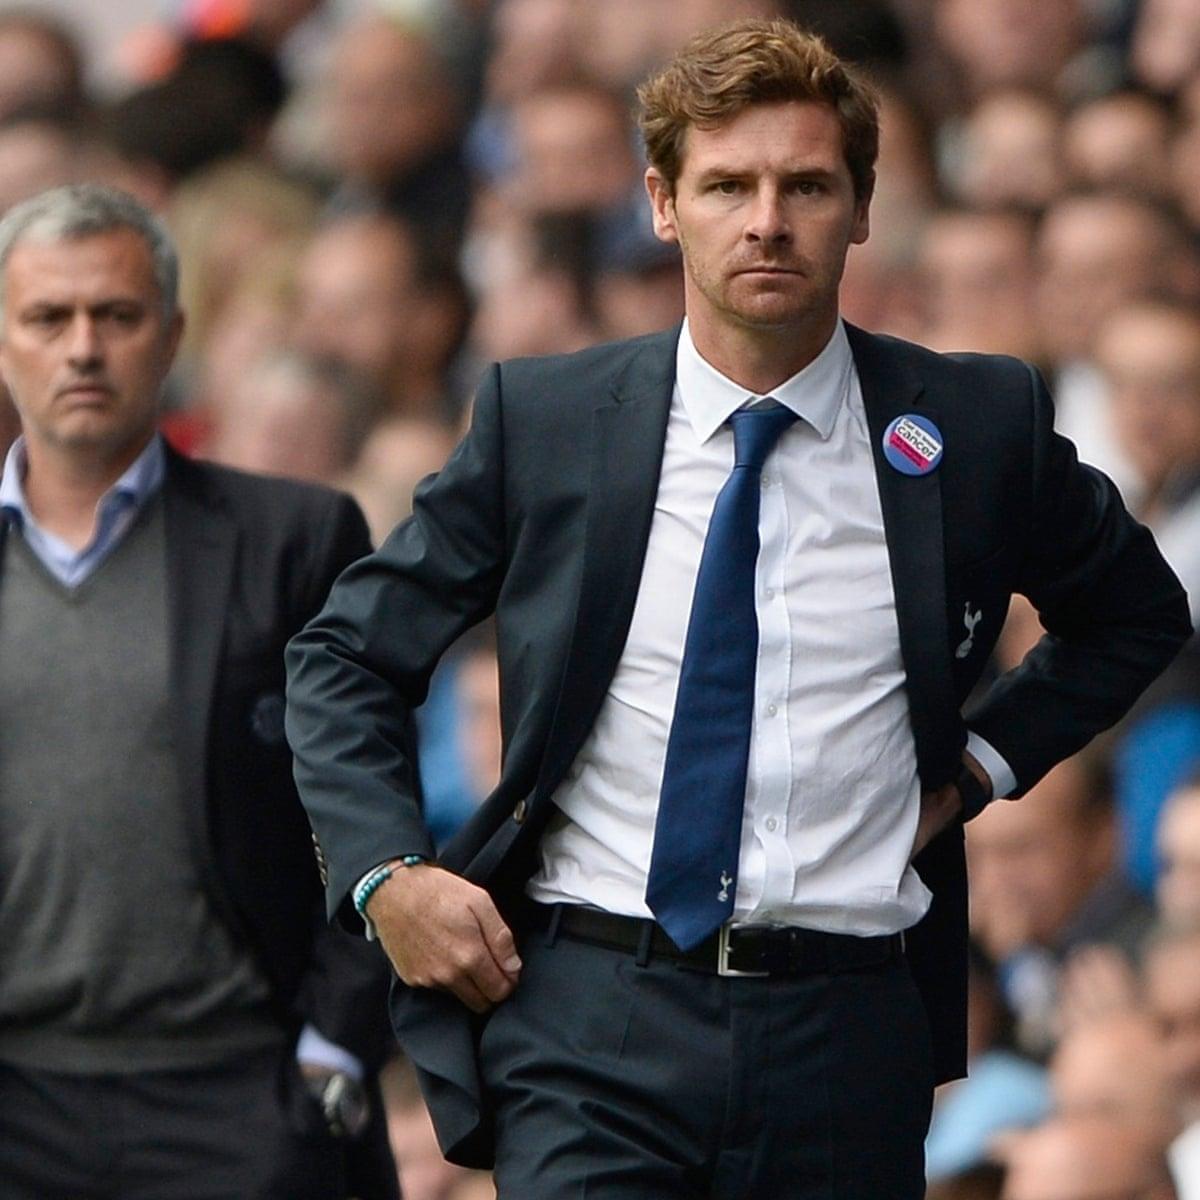 André Villas Boas Blasts Chelsea S Incredible Sacking Of José Mourinho André Villas Boas The Guardian